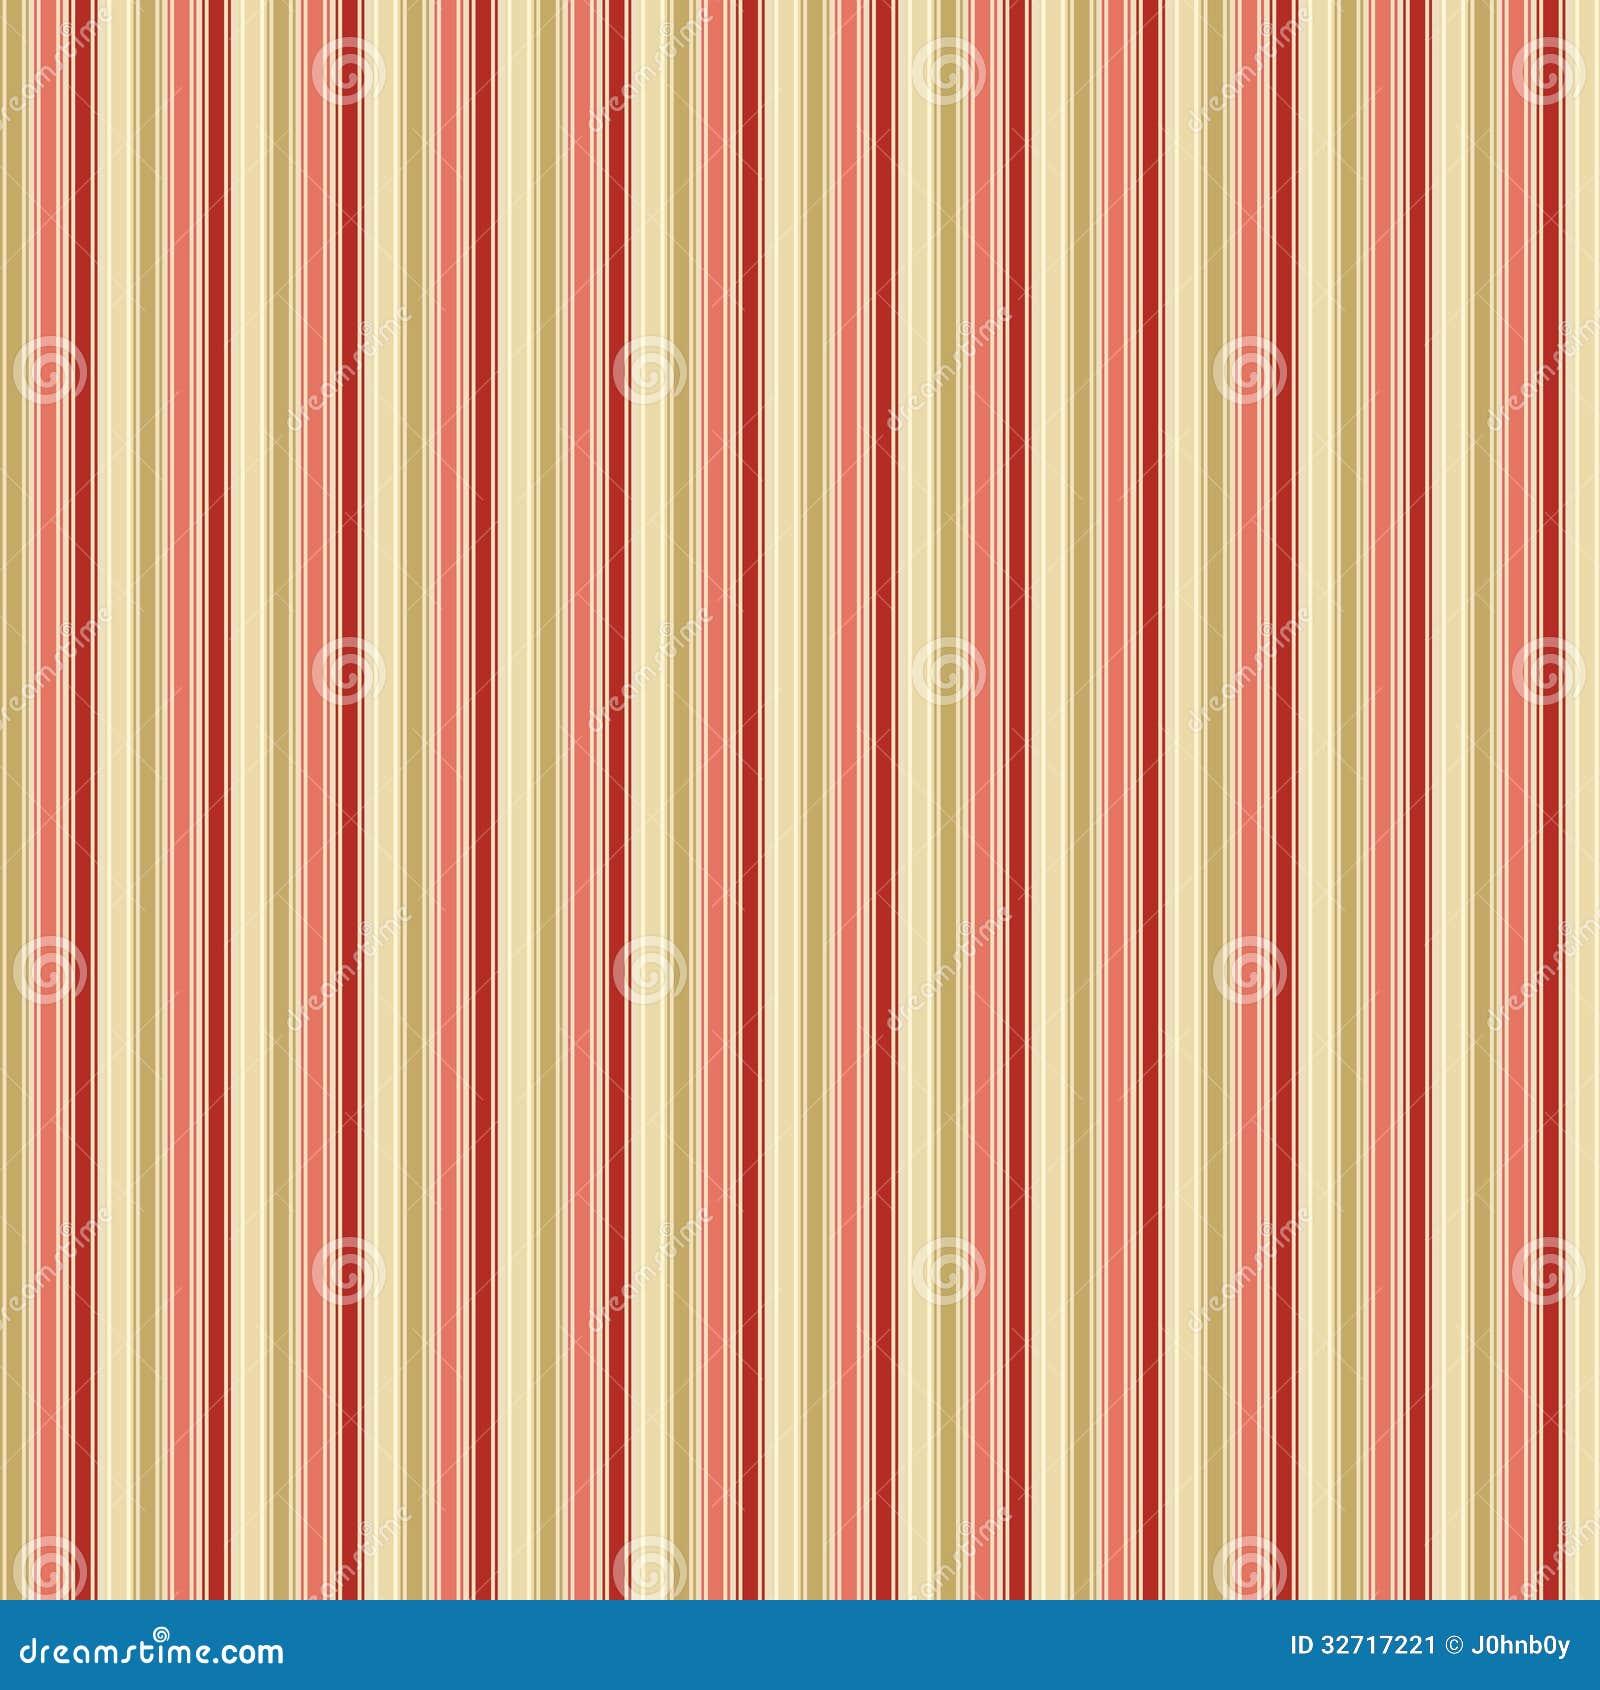 papier peint ray victorien image stock image 32717221. Black Bedroom Furniture Sets. Home Design Ideas